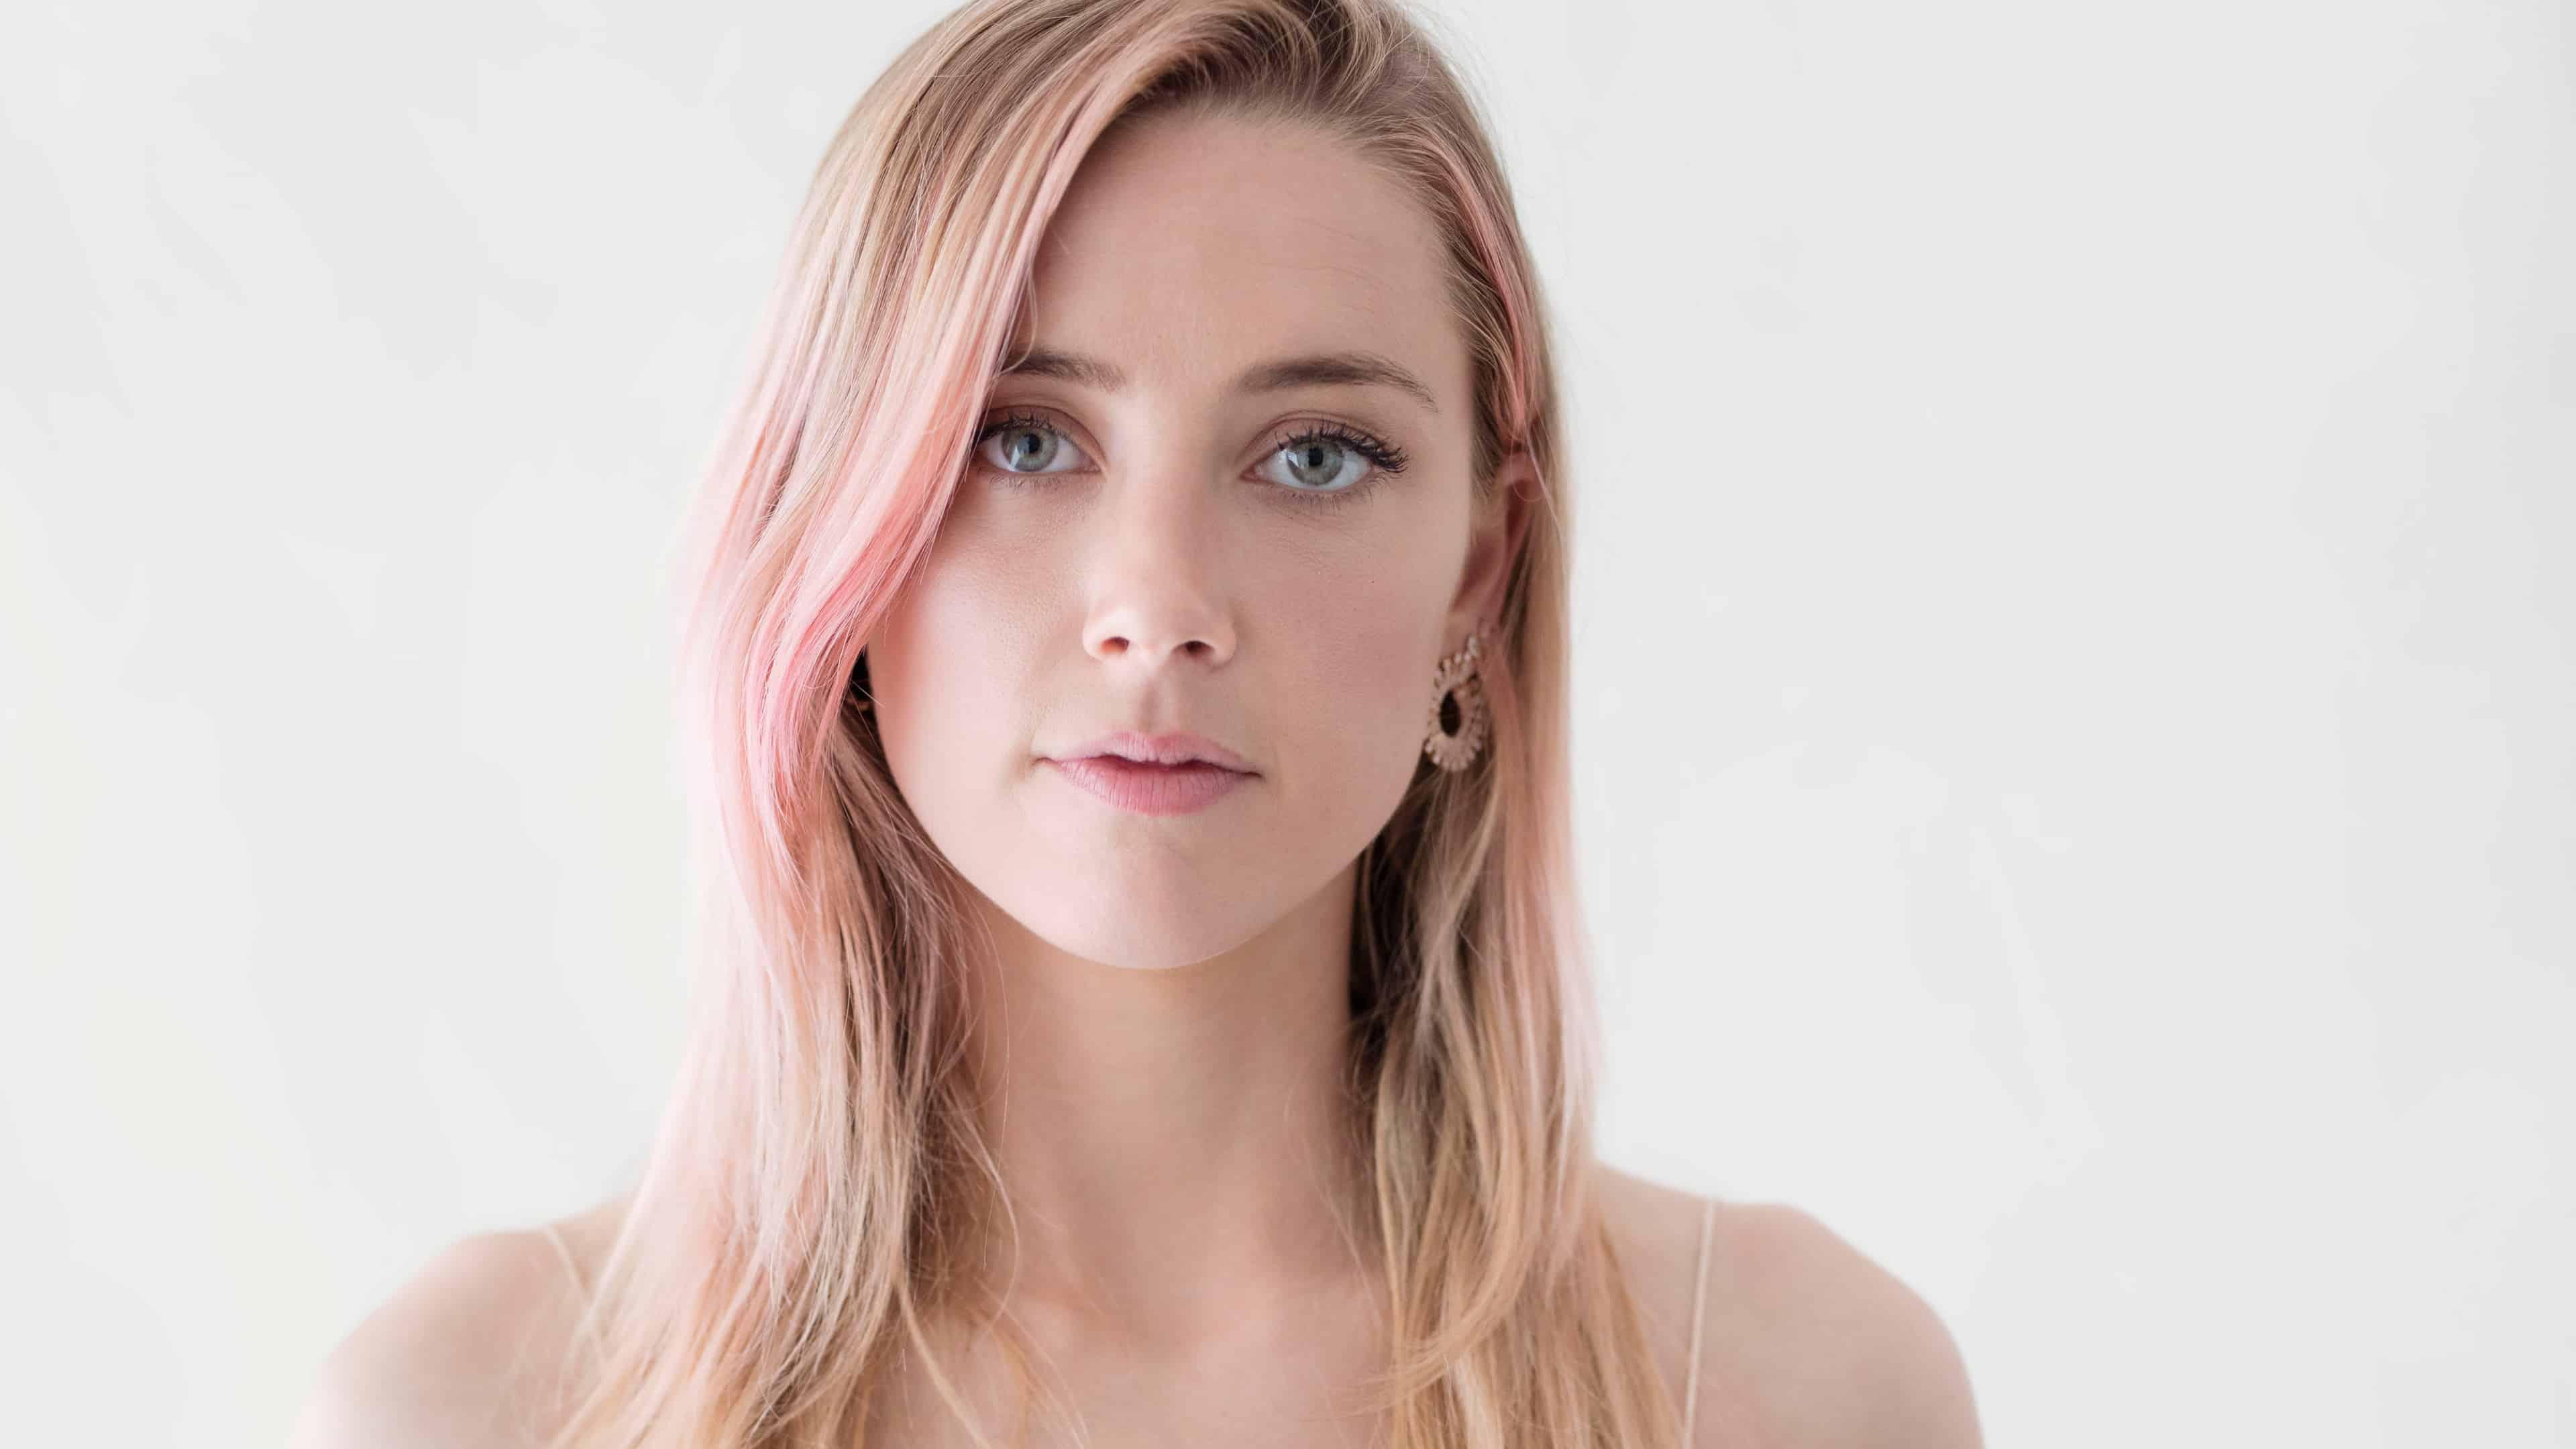 New Trucks 2018 >> Amber Heard Portrait UHD 4K Wallpaper | Pixelz